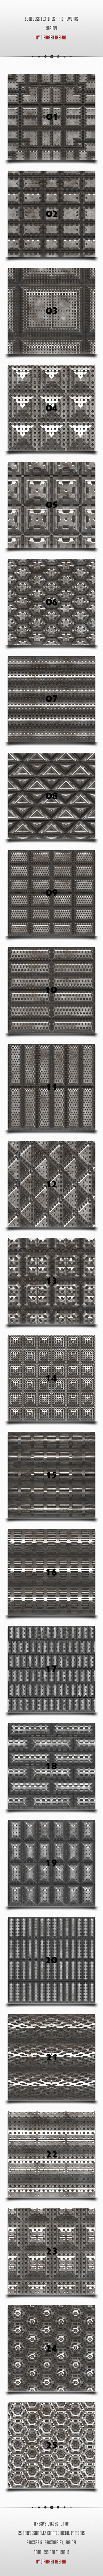 Seamless Textures Metalworks